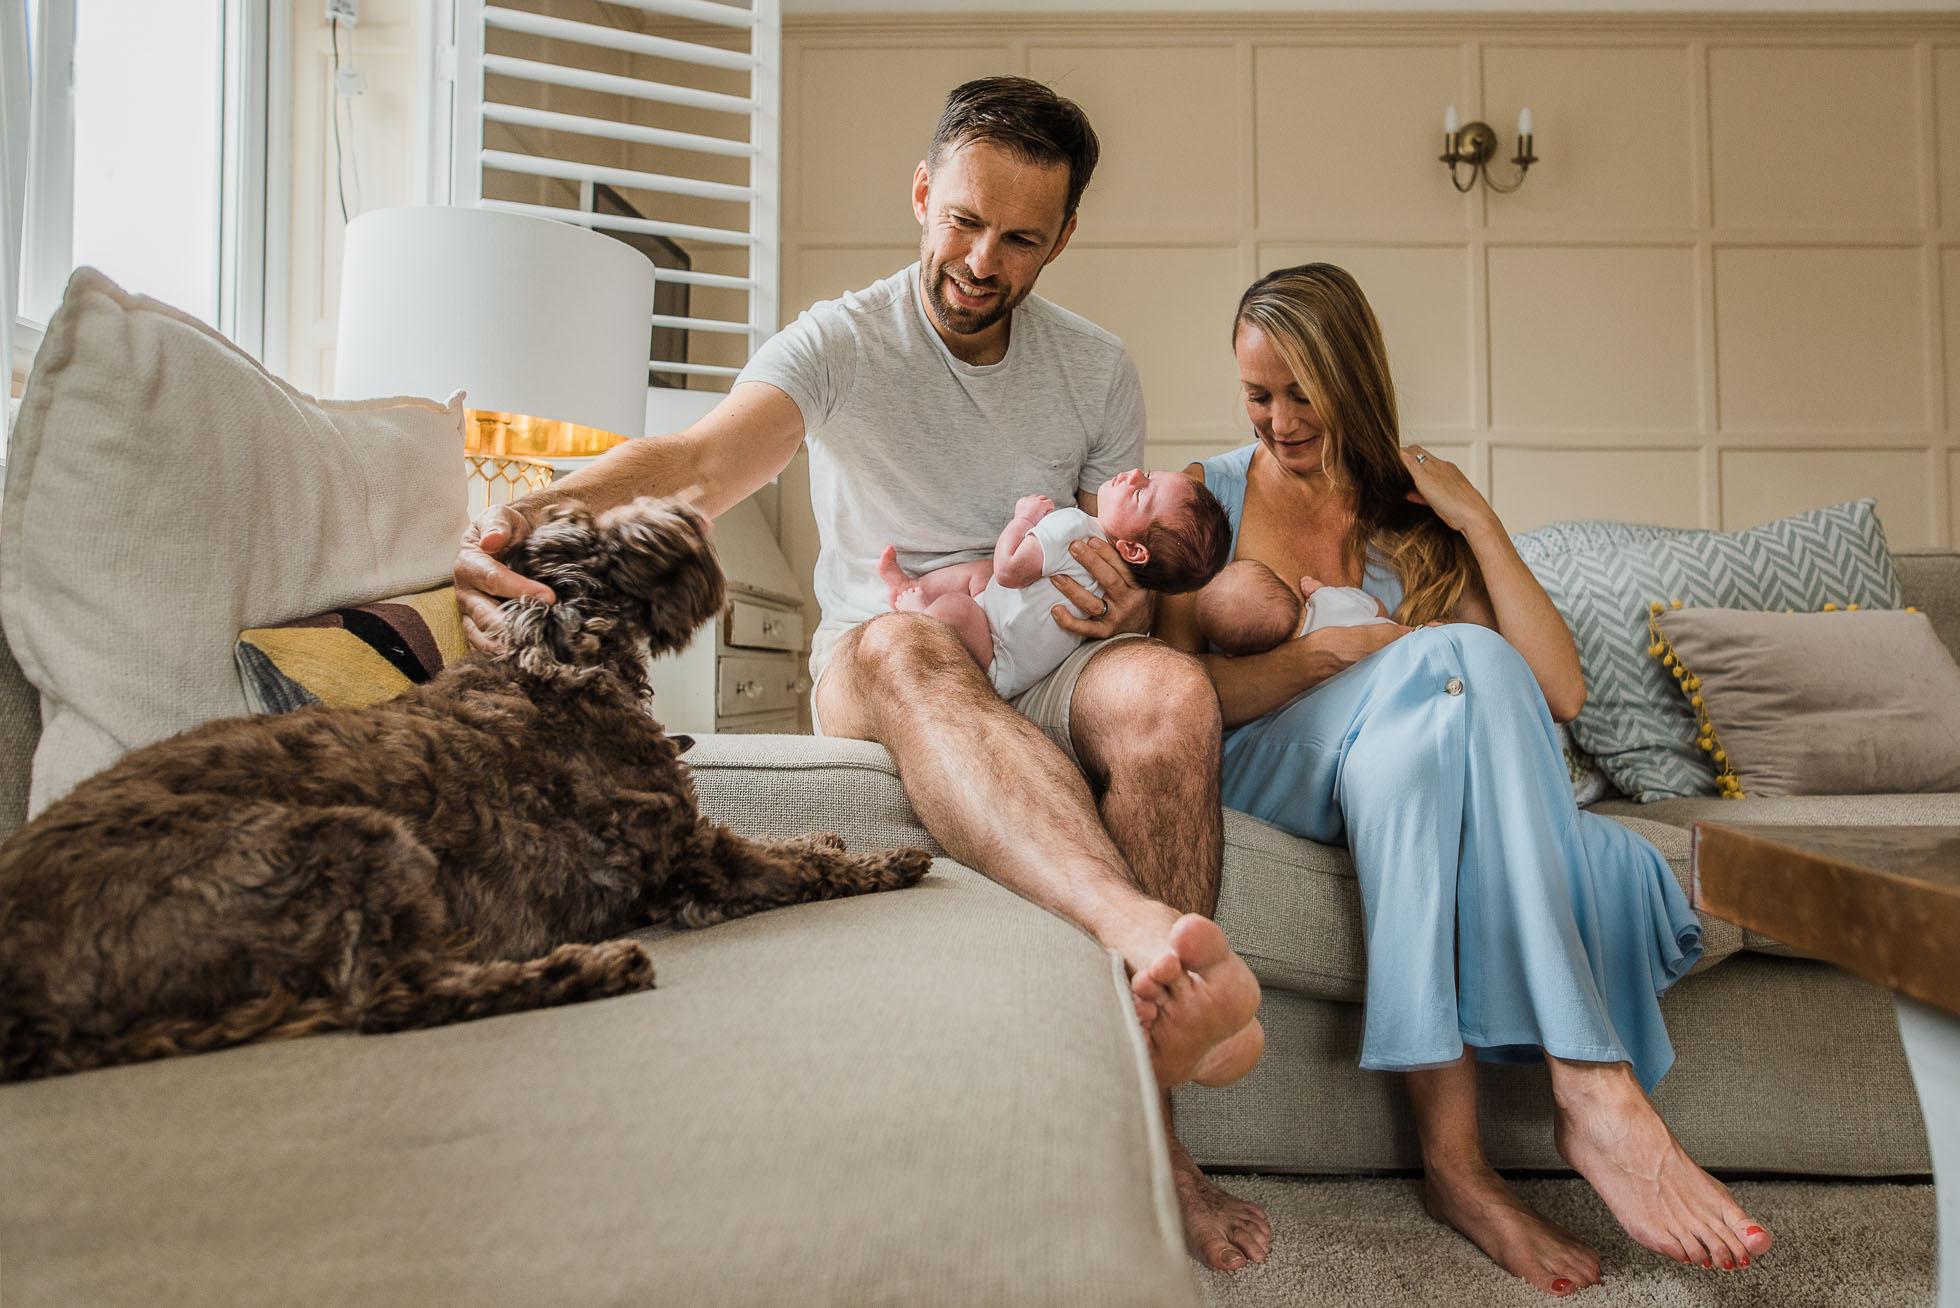 Family-Photoshoot-Twins-Indoor-Cheltenham Photographer Chui King Li Photography-.jpg